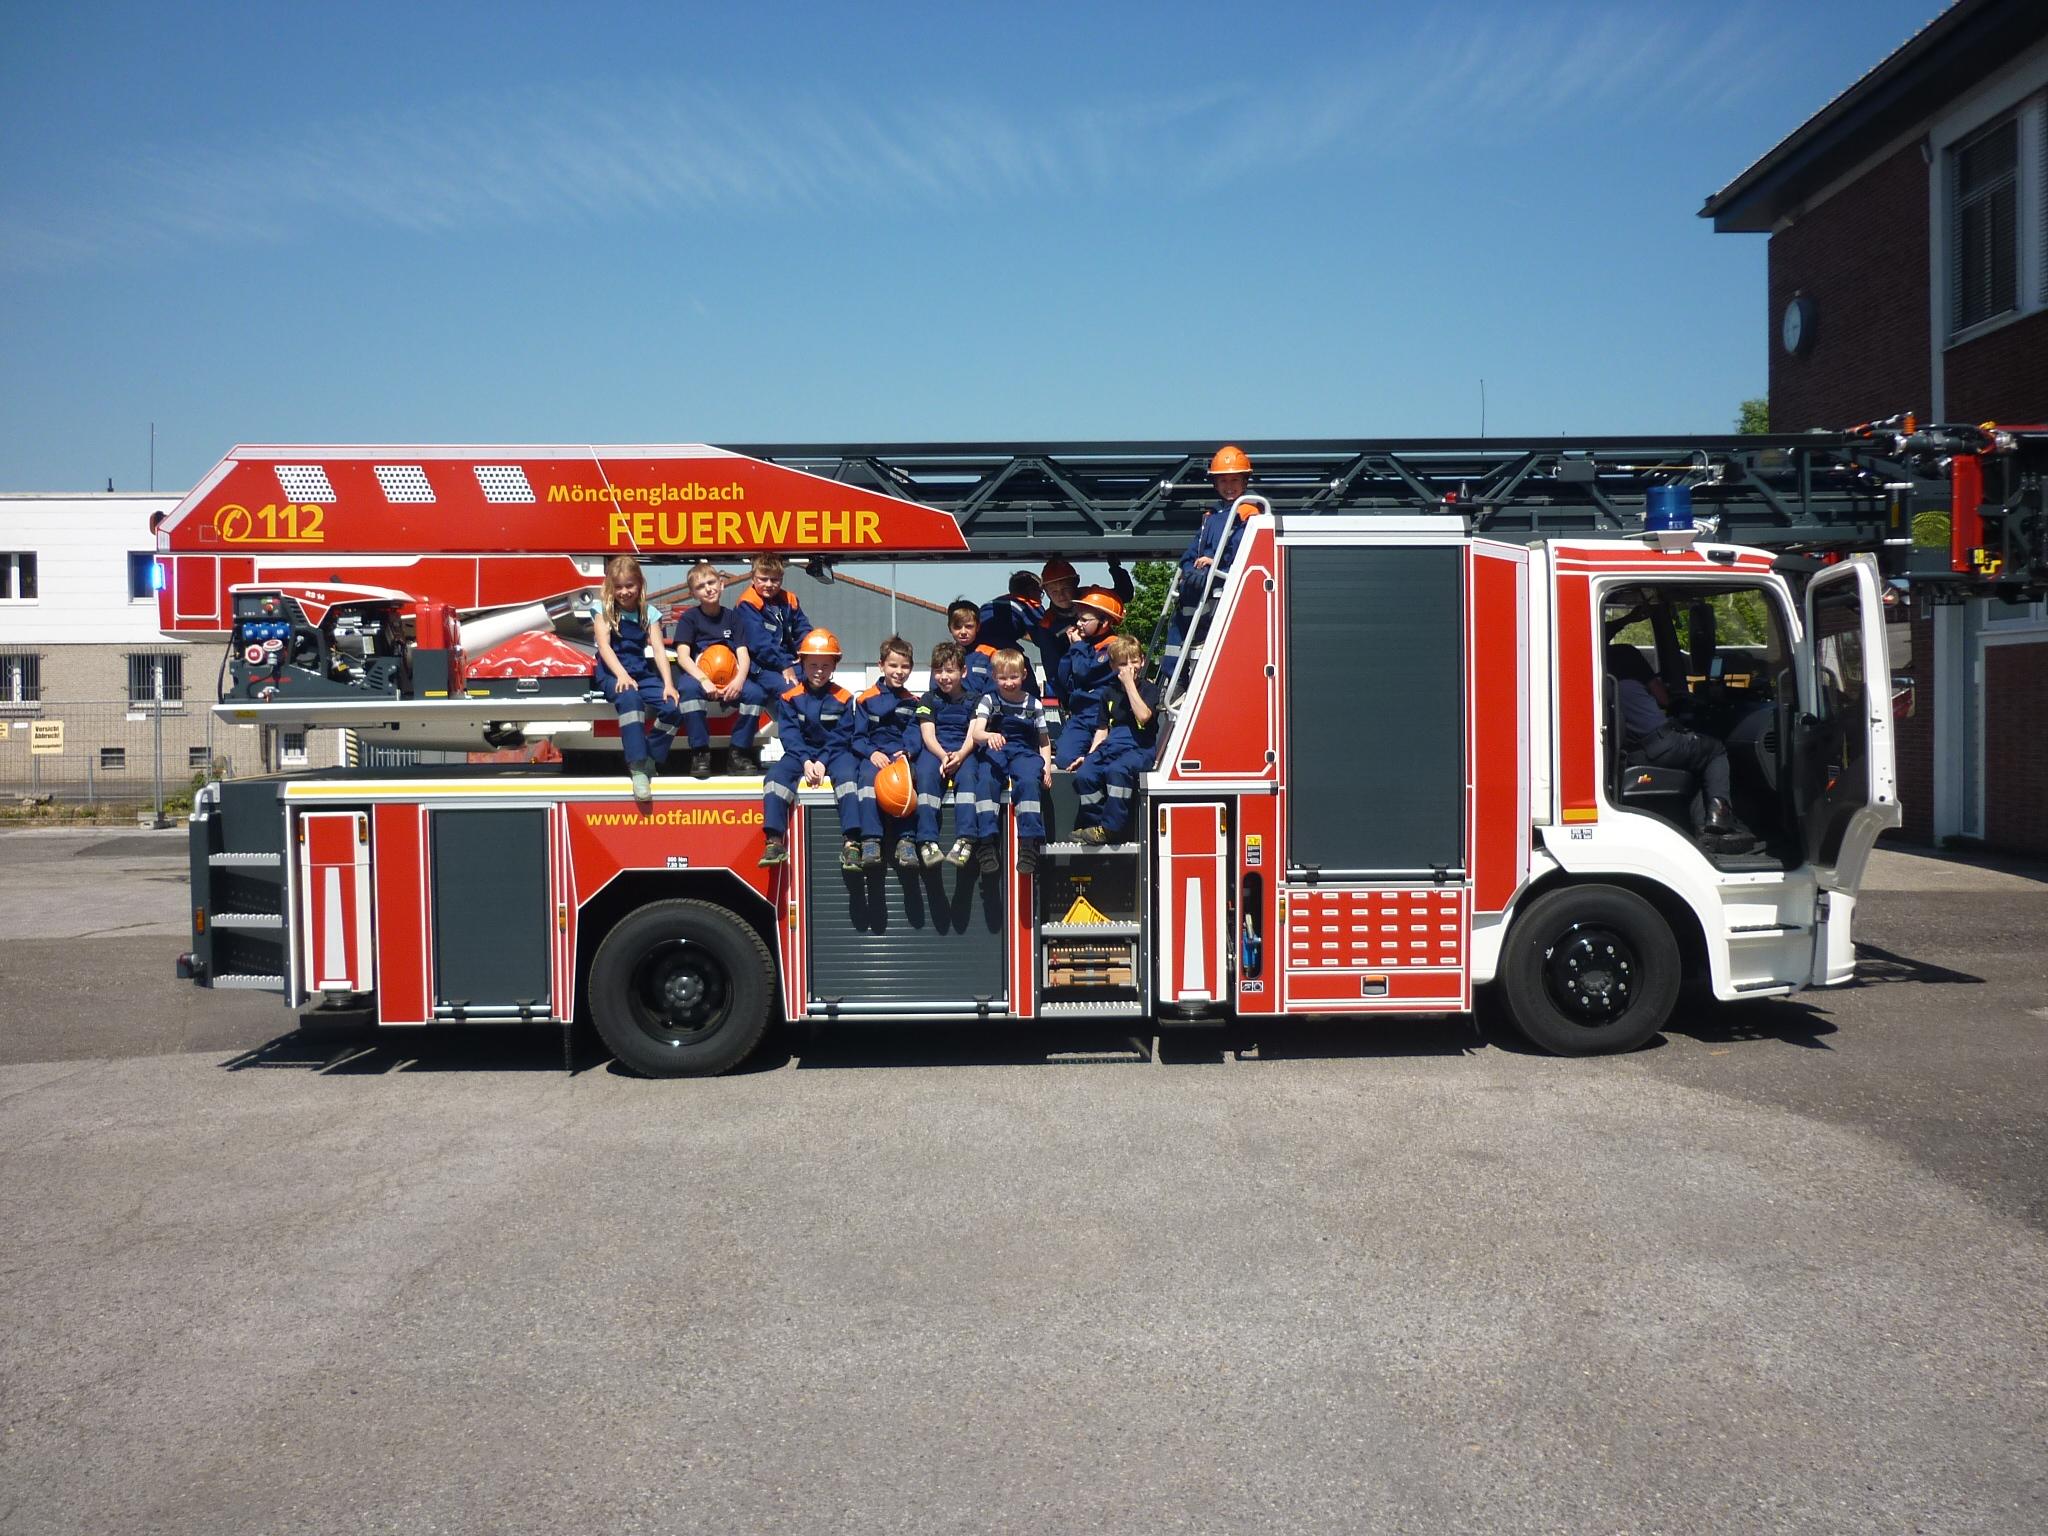 Feuerwehr-AG on Tour